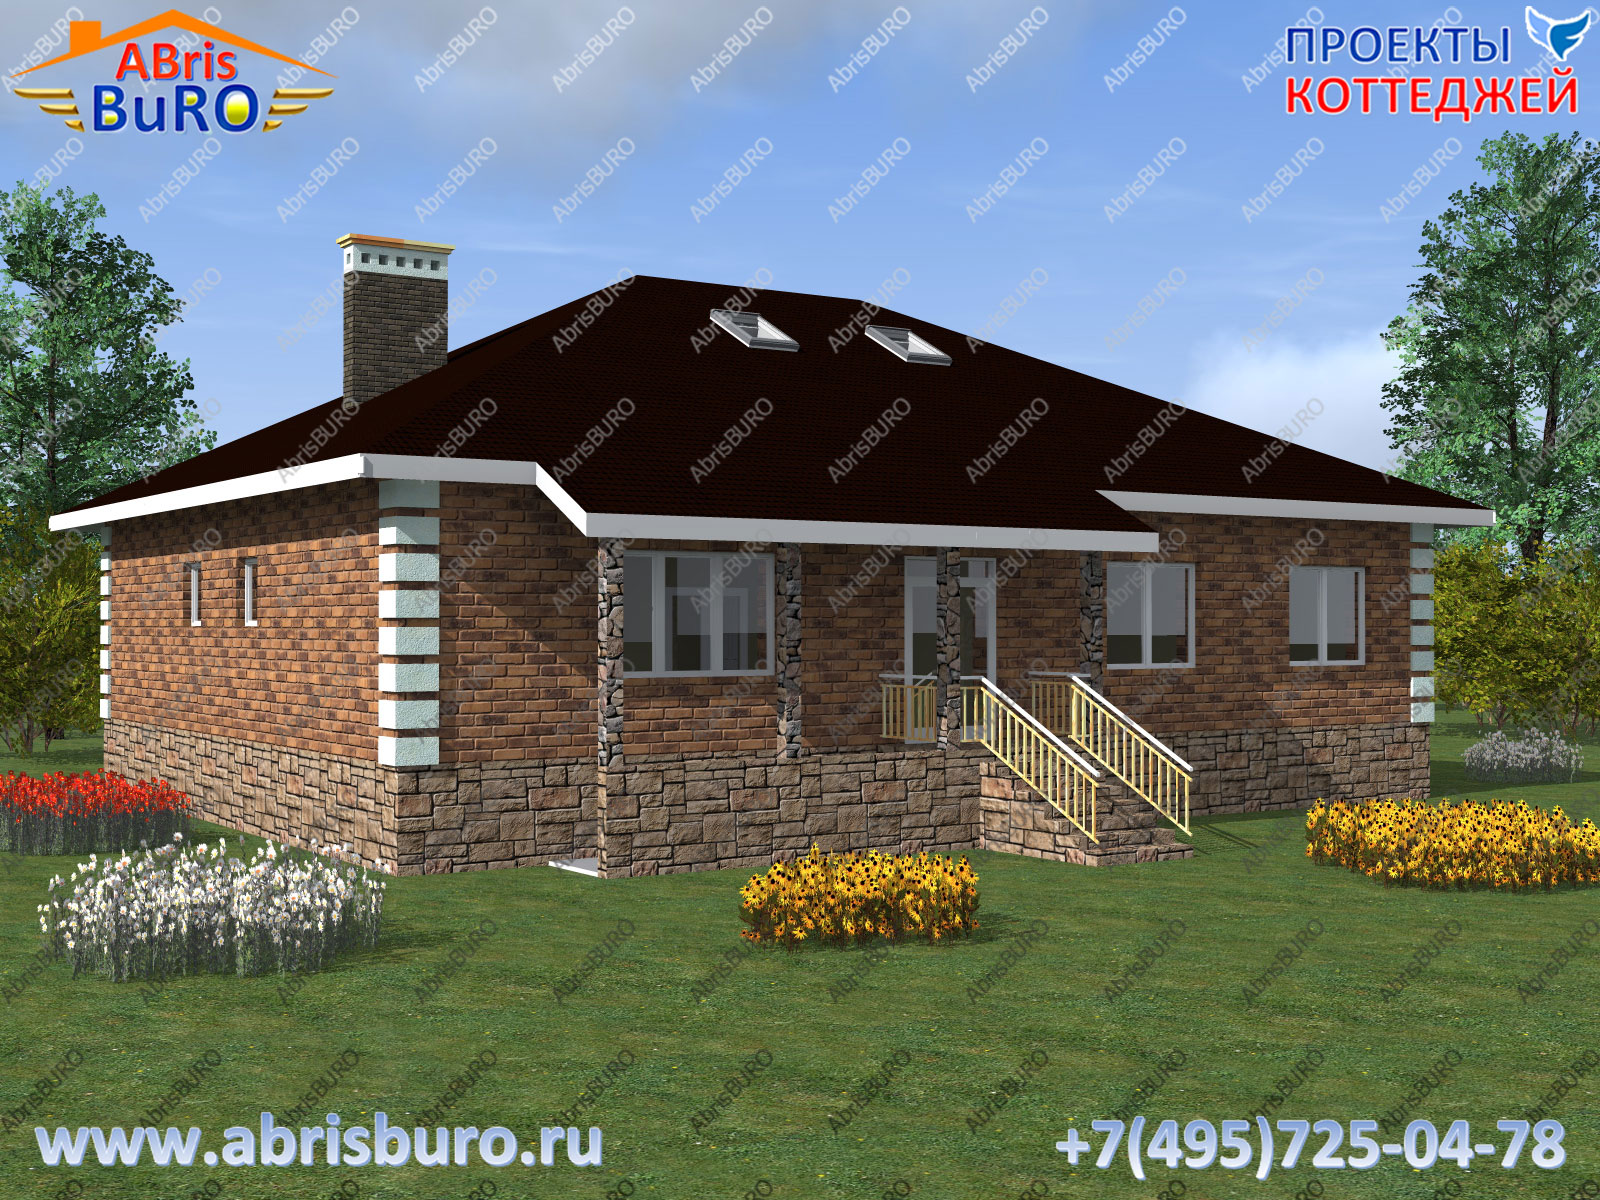 Фасад дома 3d K2091-231